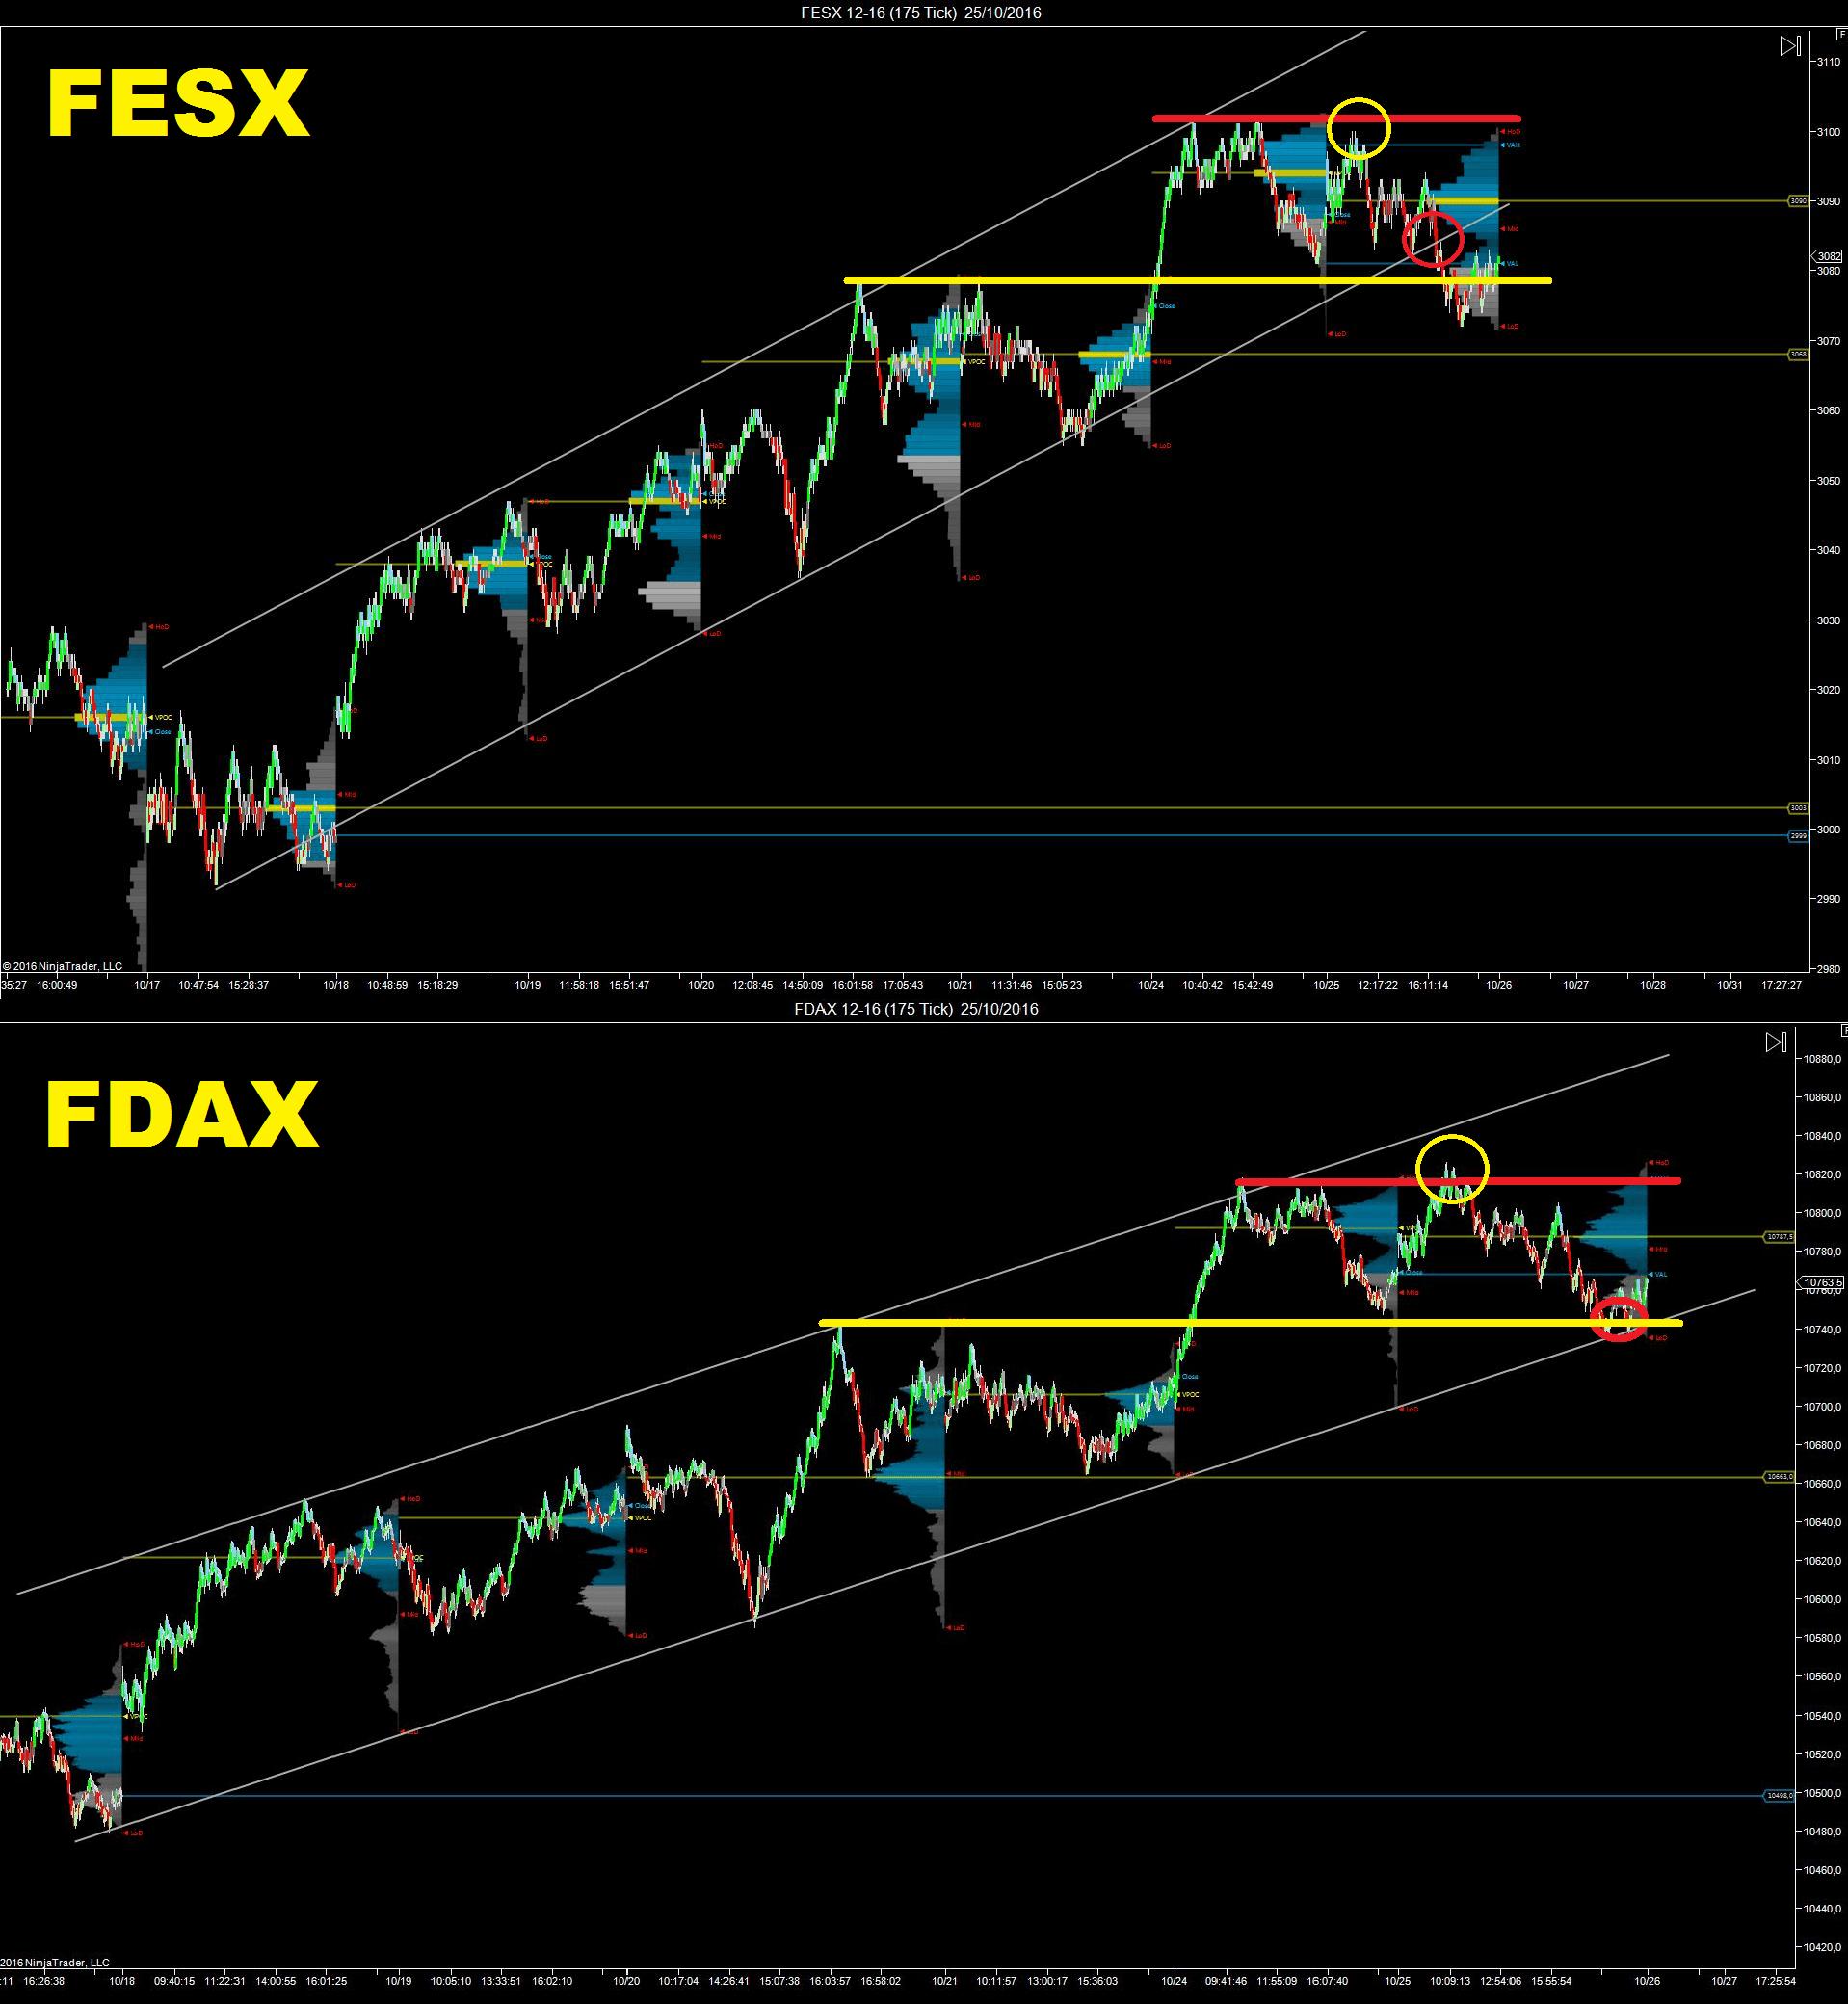 fdax-fesx